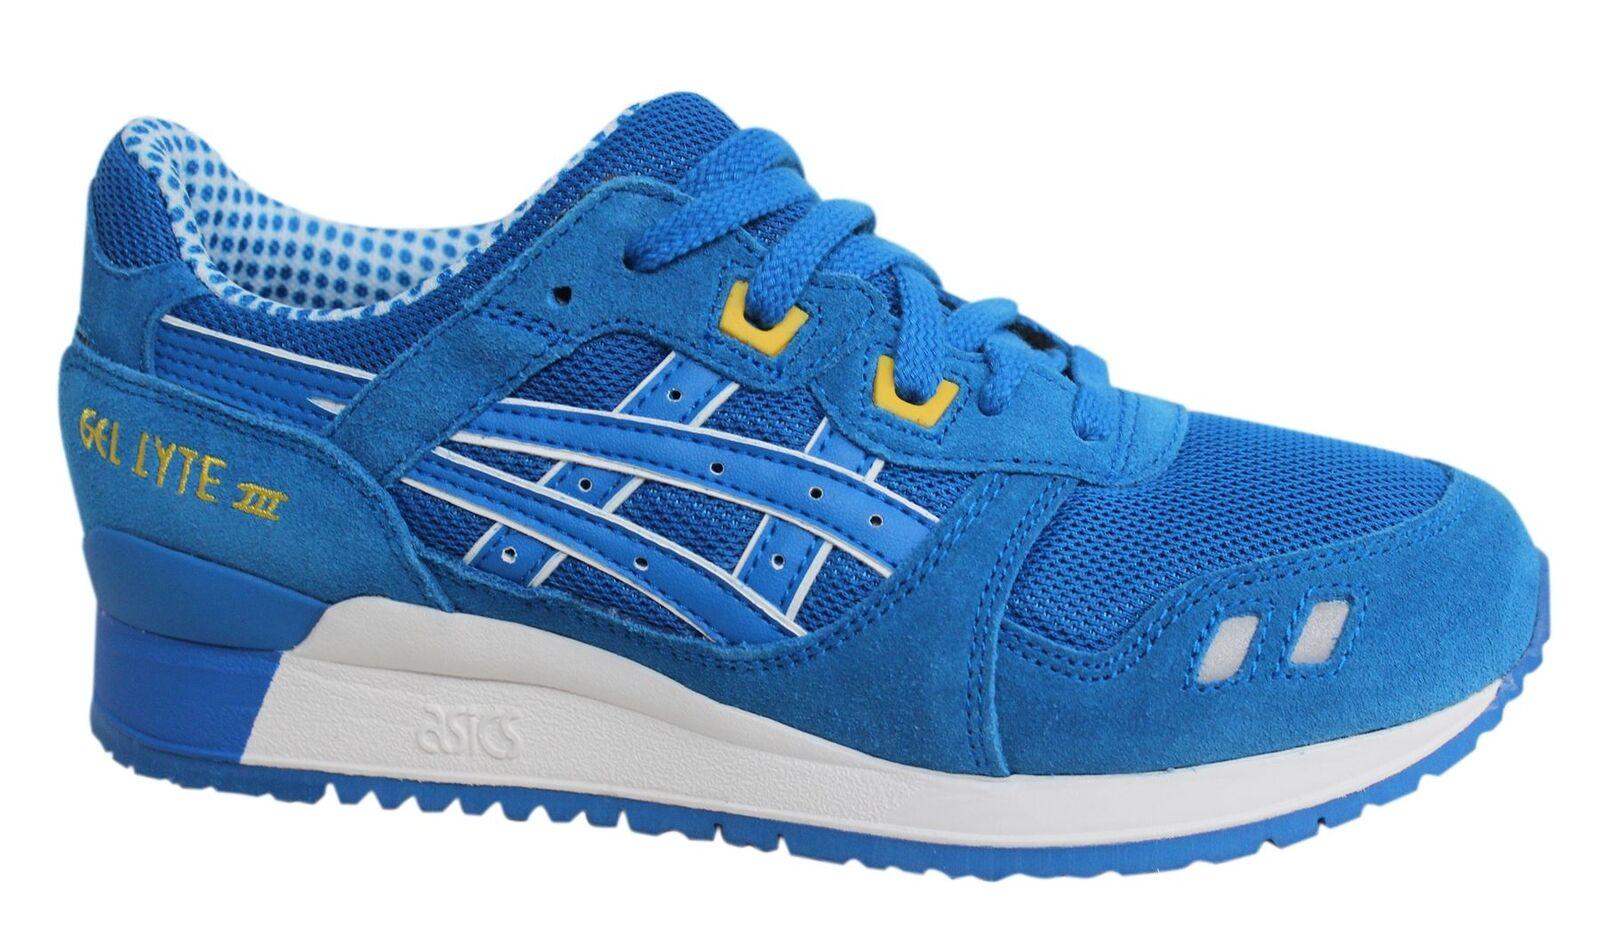 Asics Gel-Lyte III Cordones 4949 Cuero Azul Zapatillas Hombre h40nq 4949 Cordones u117 5afbb8